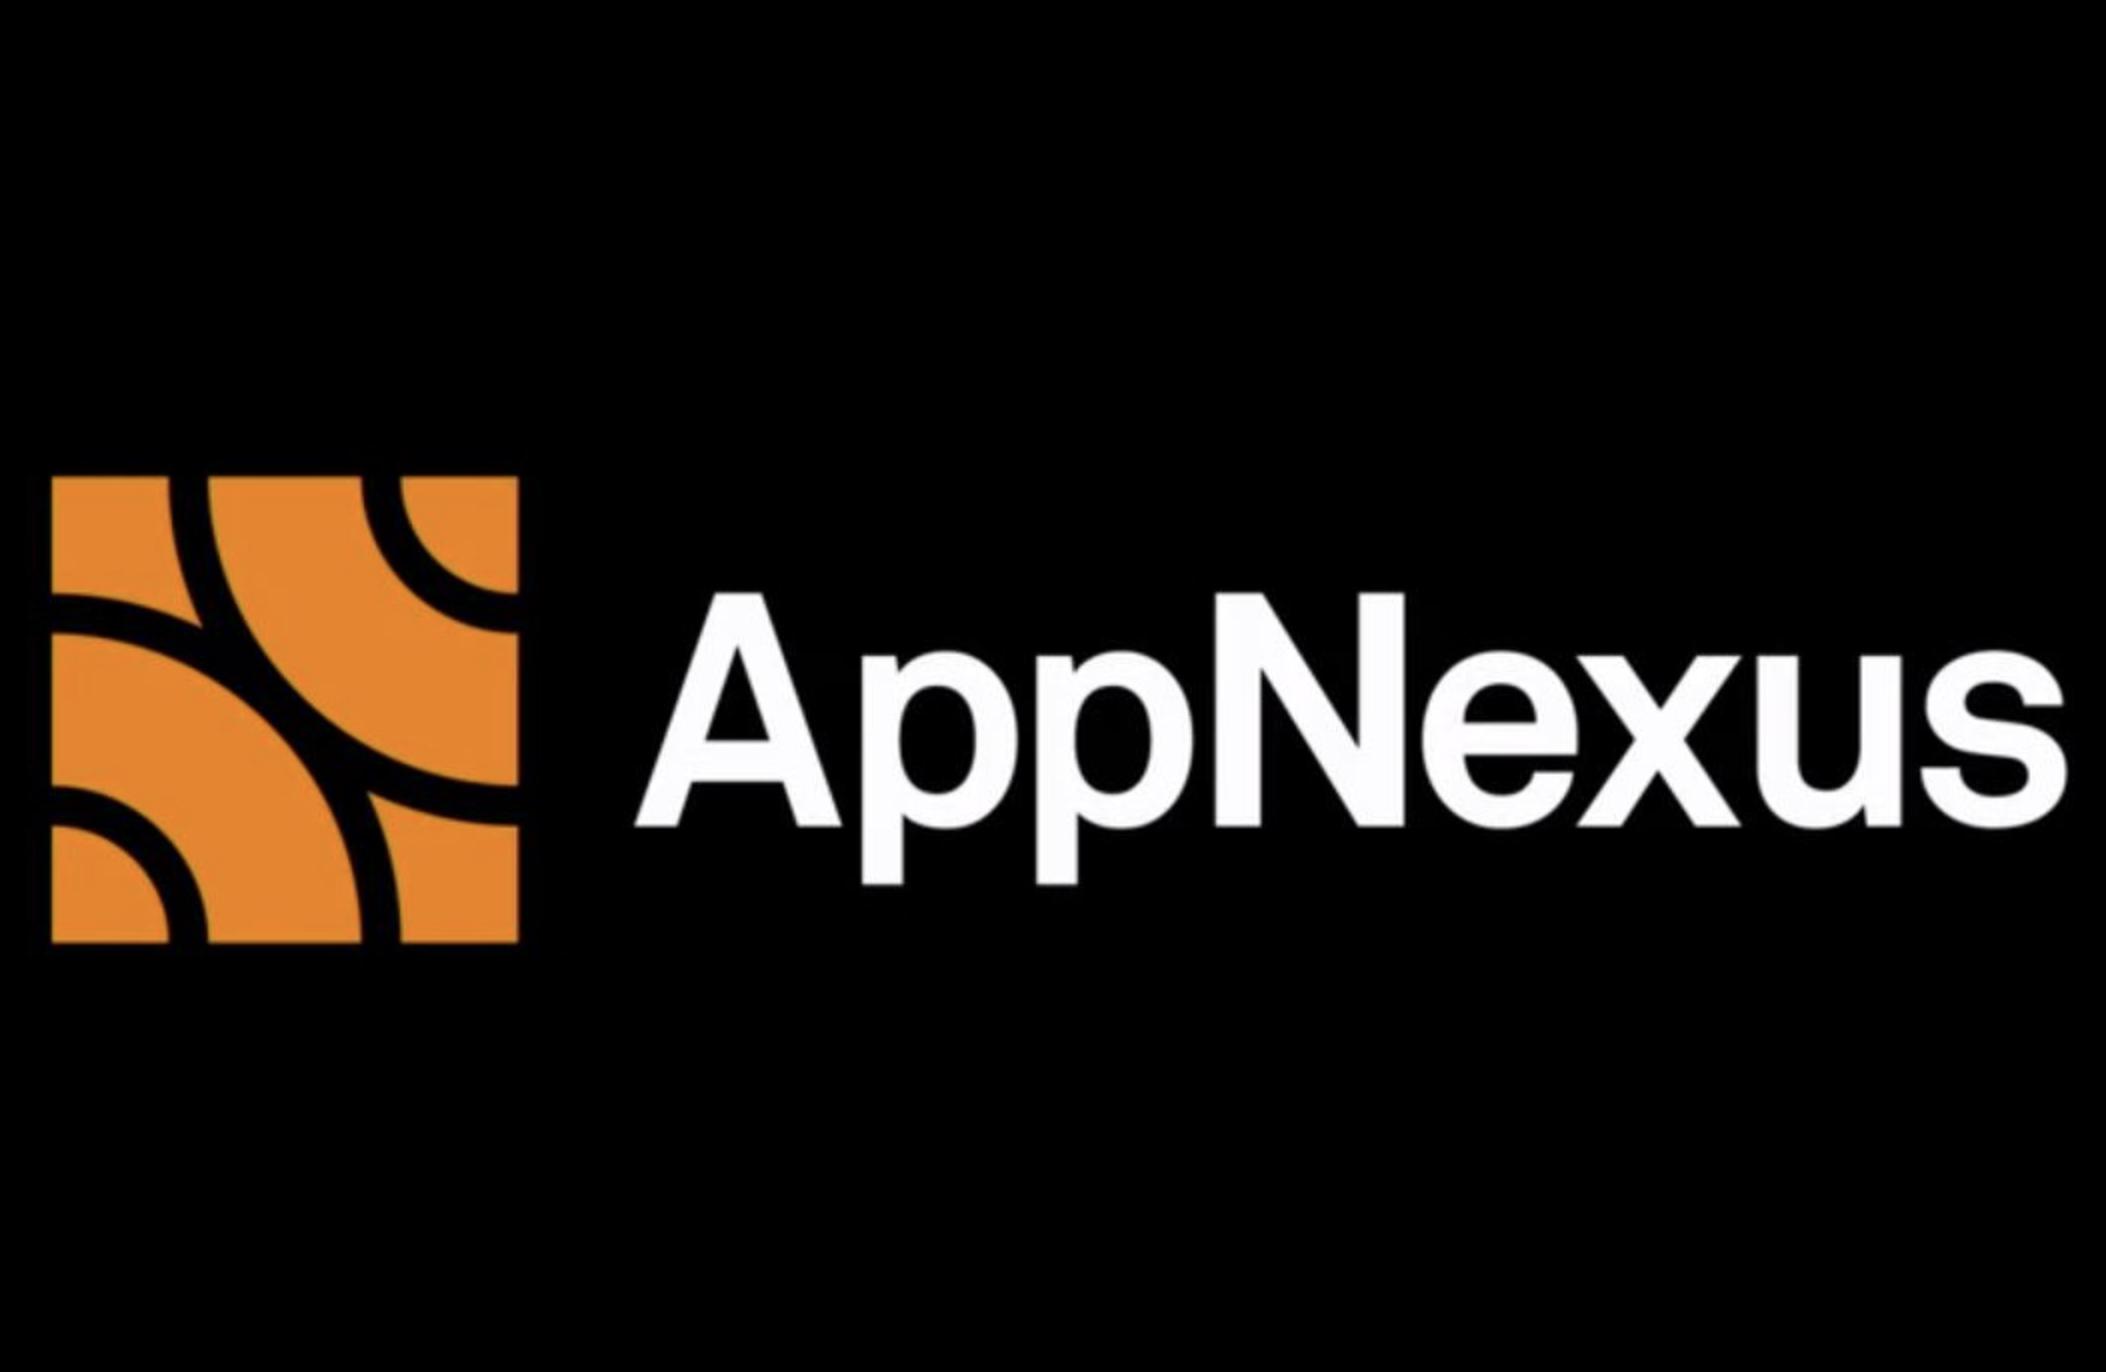 Appnexus logo white